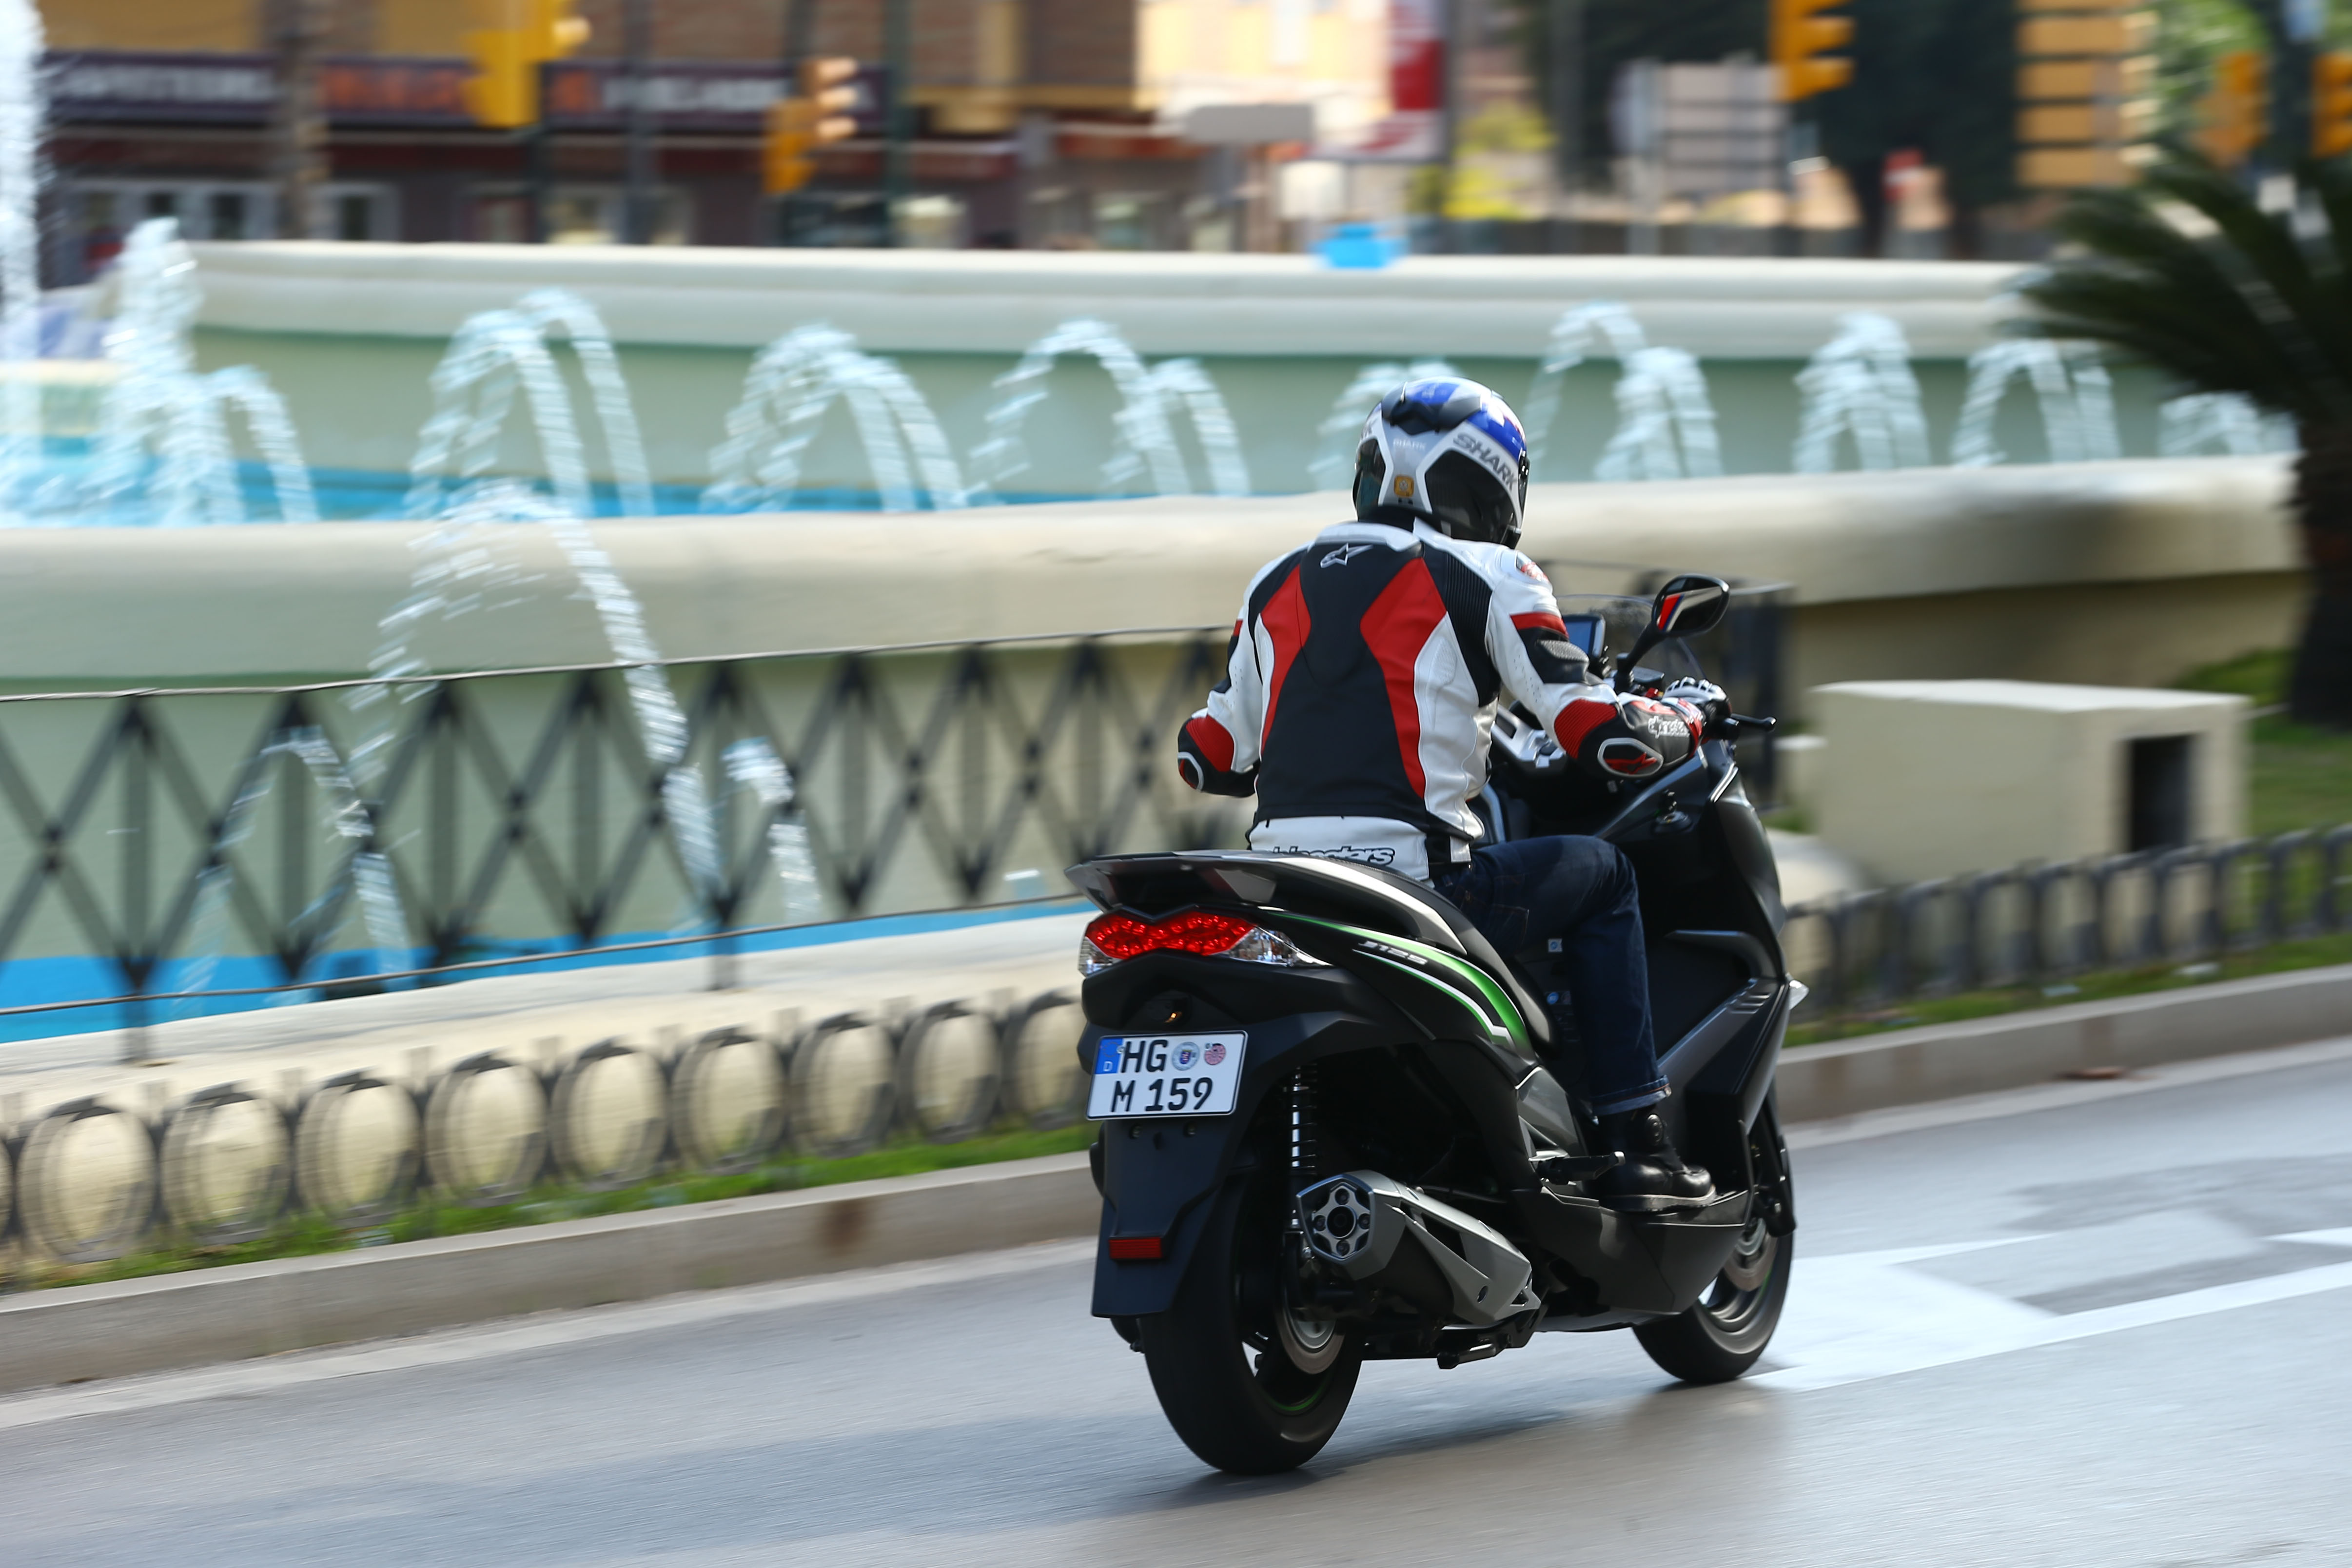 first ride: kawasaki j125 review | visordown